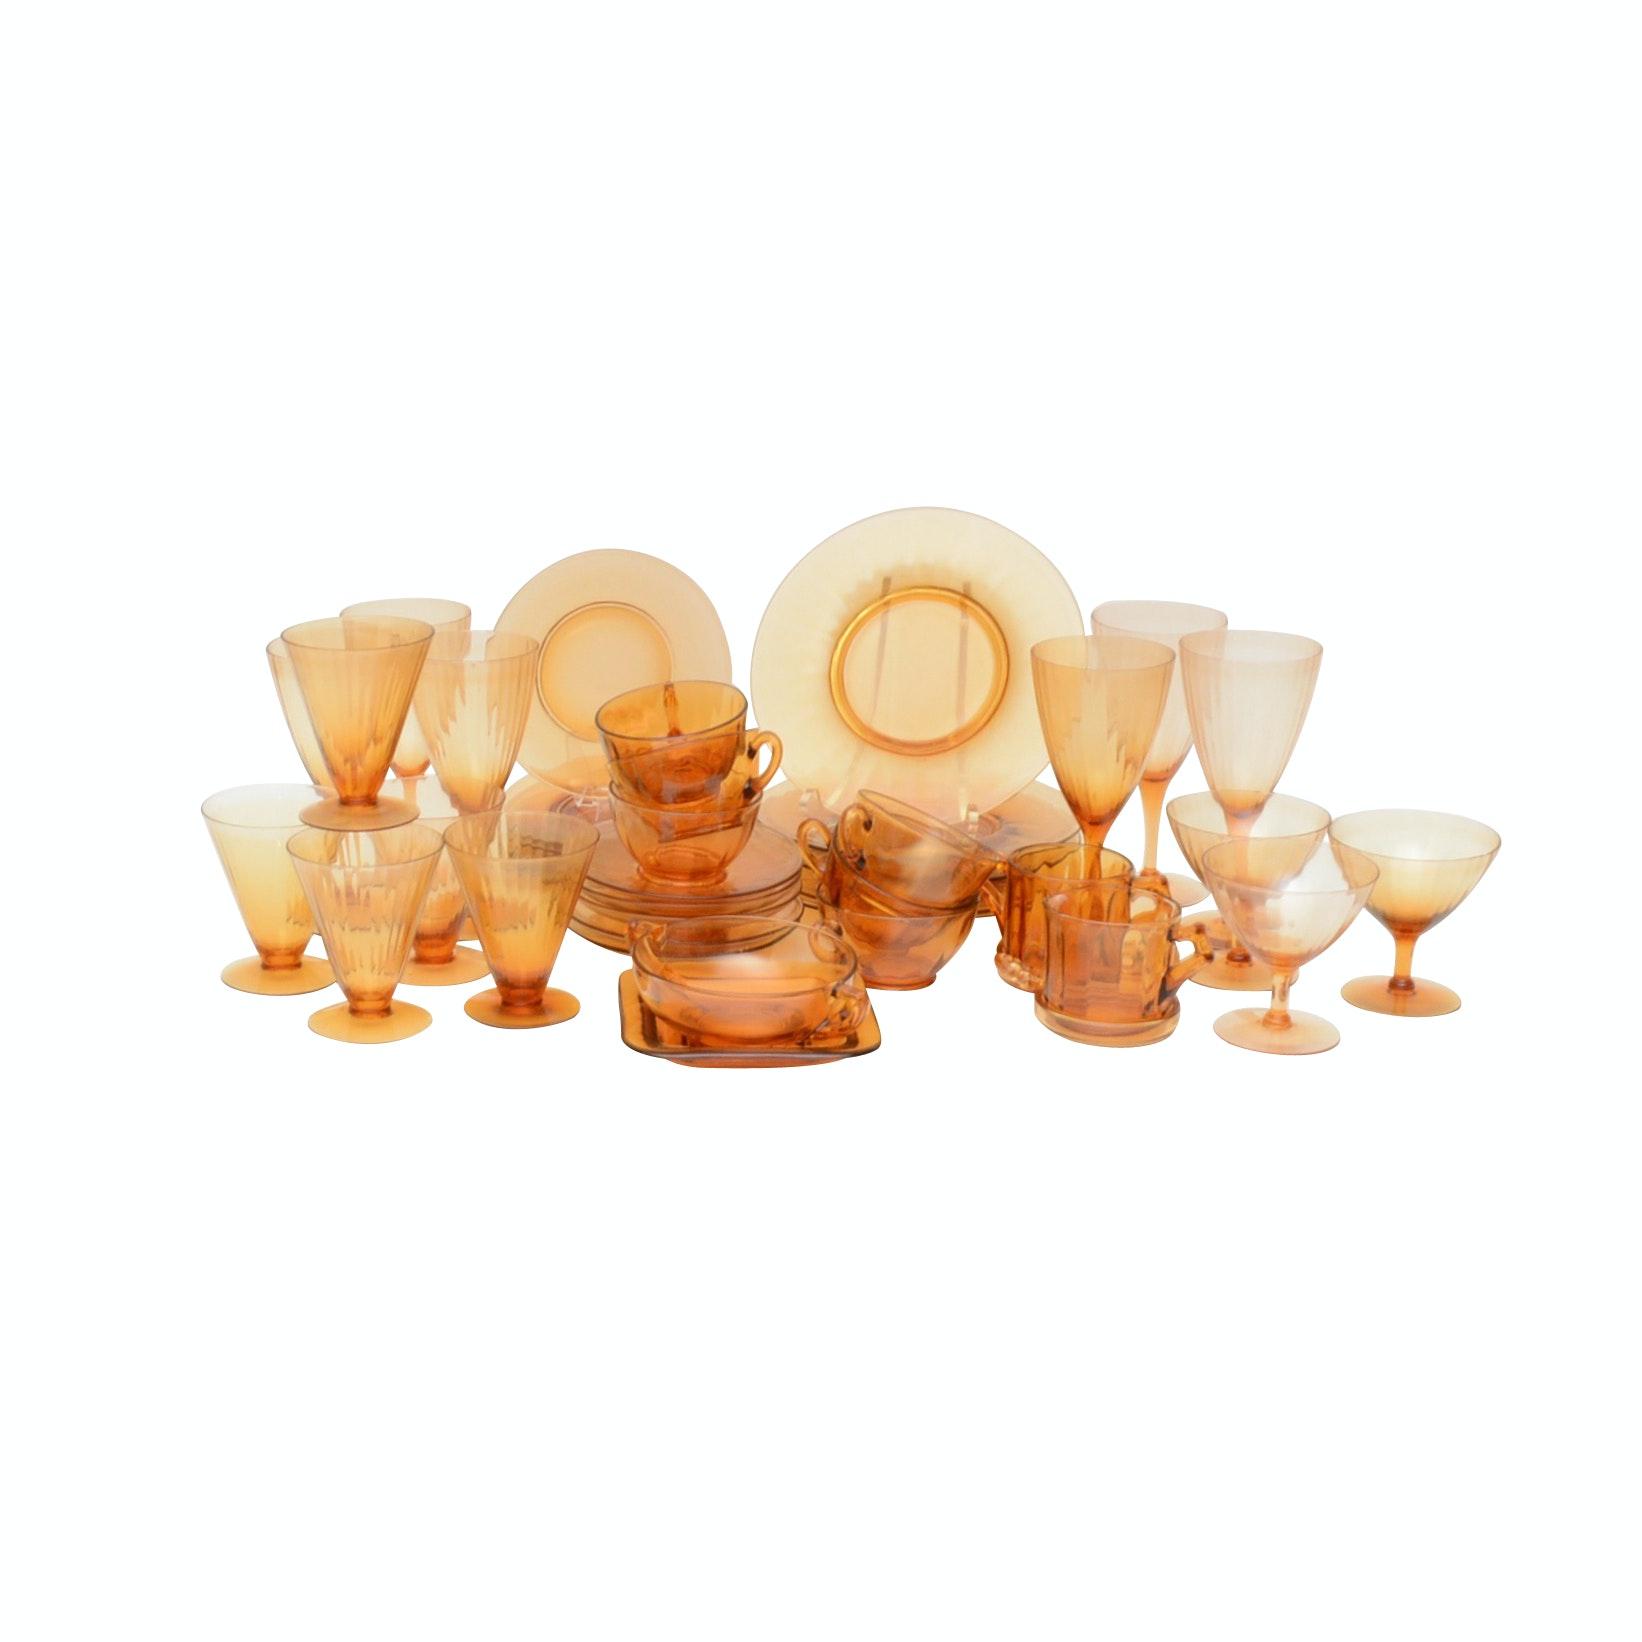 Antique Amber Cambridge Glass